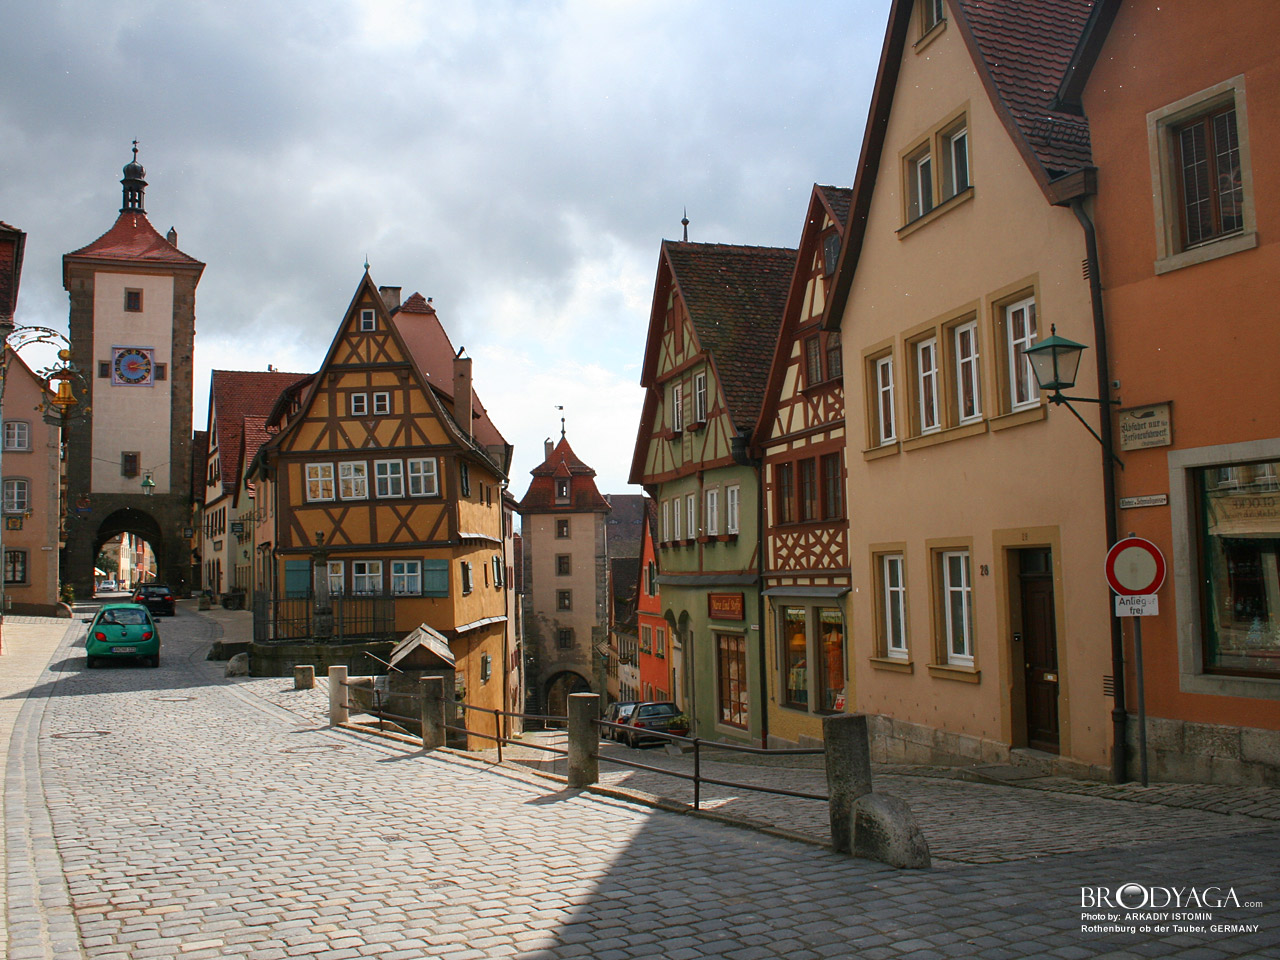 Rothenburg ob der Tauber | Beautiful Town | Travel And Tourism: globaltraveltorusim.blogspot.com/2013/08/Rothenburg-ob-der-Tauber.html